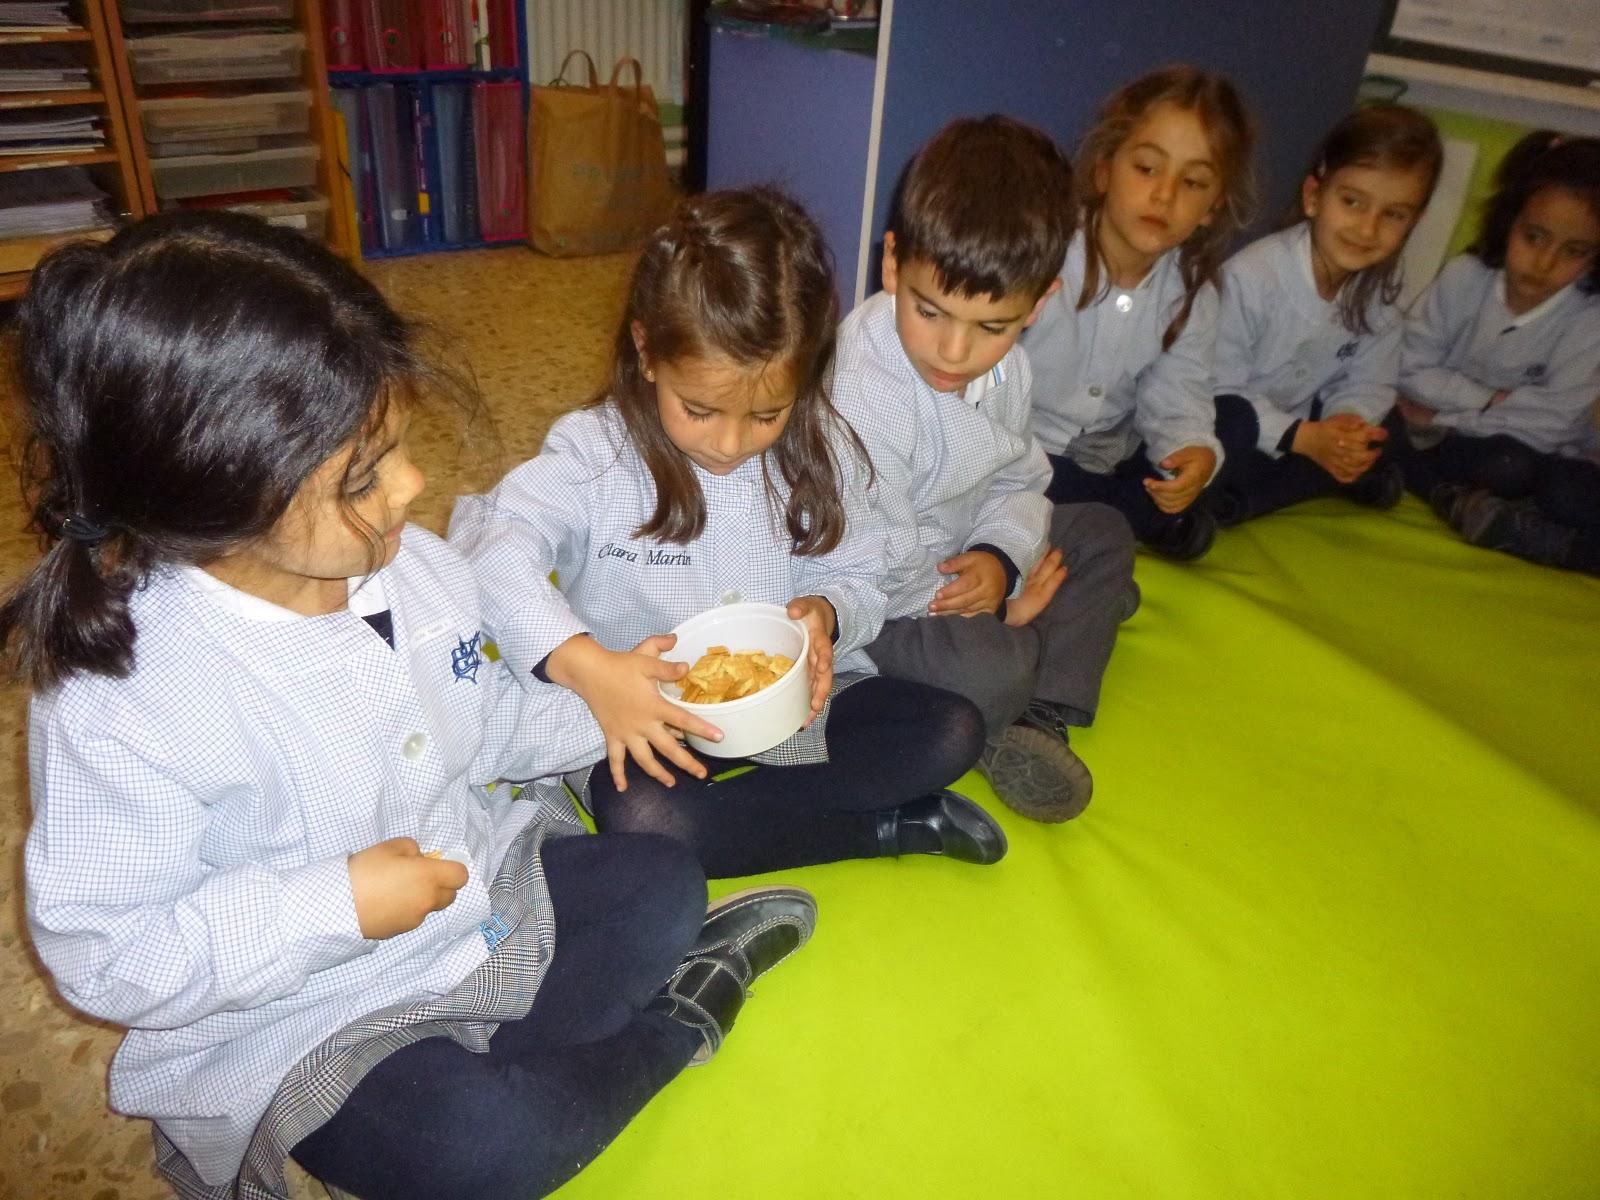 Agustinas Valladolid - 2017 - Infantil 4 - Dulce Salado 2